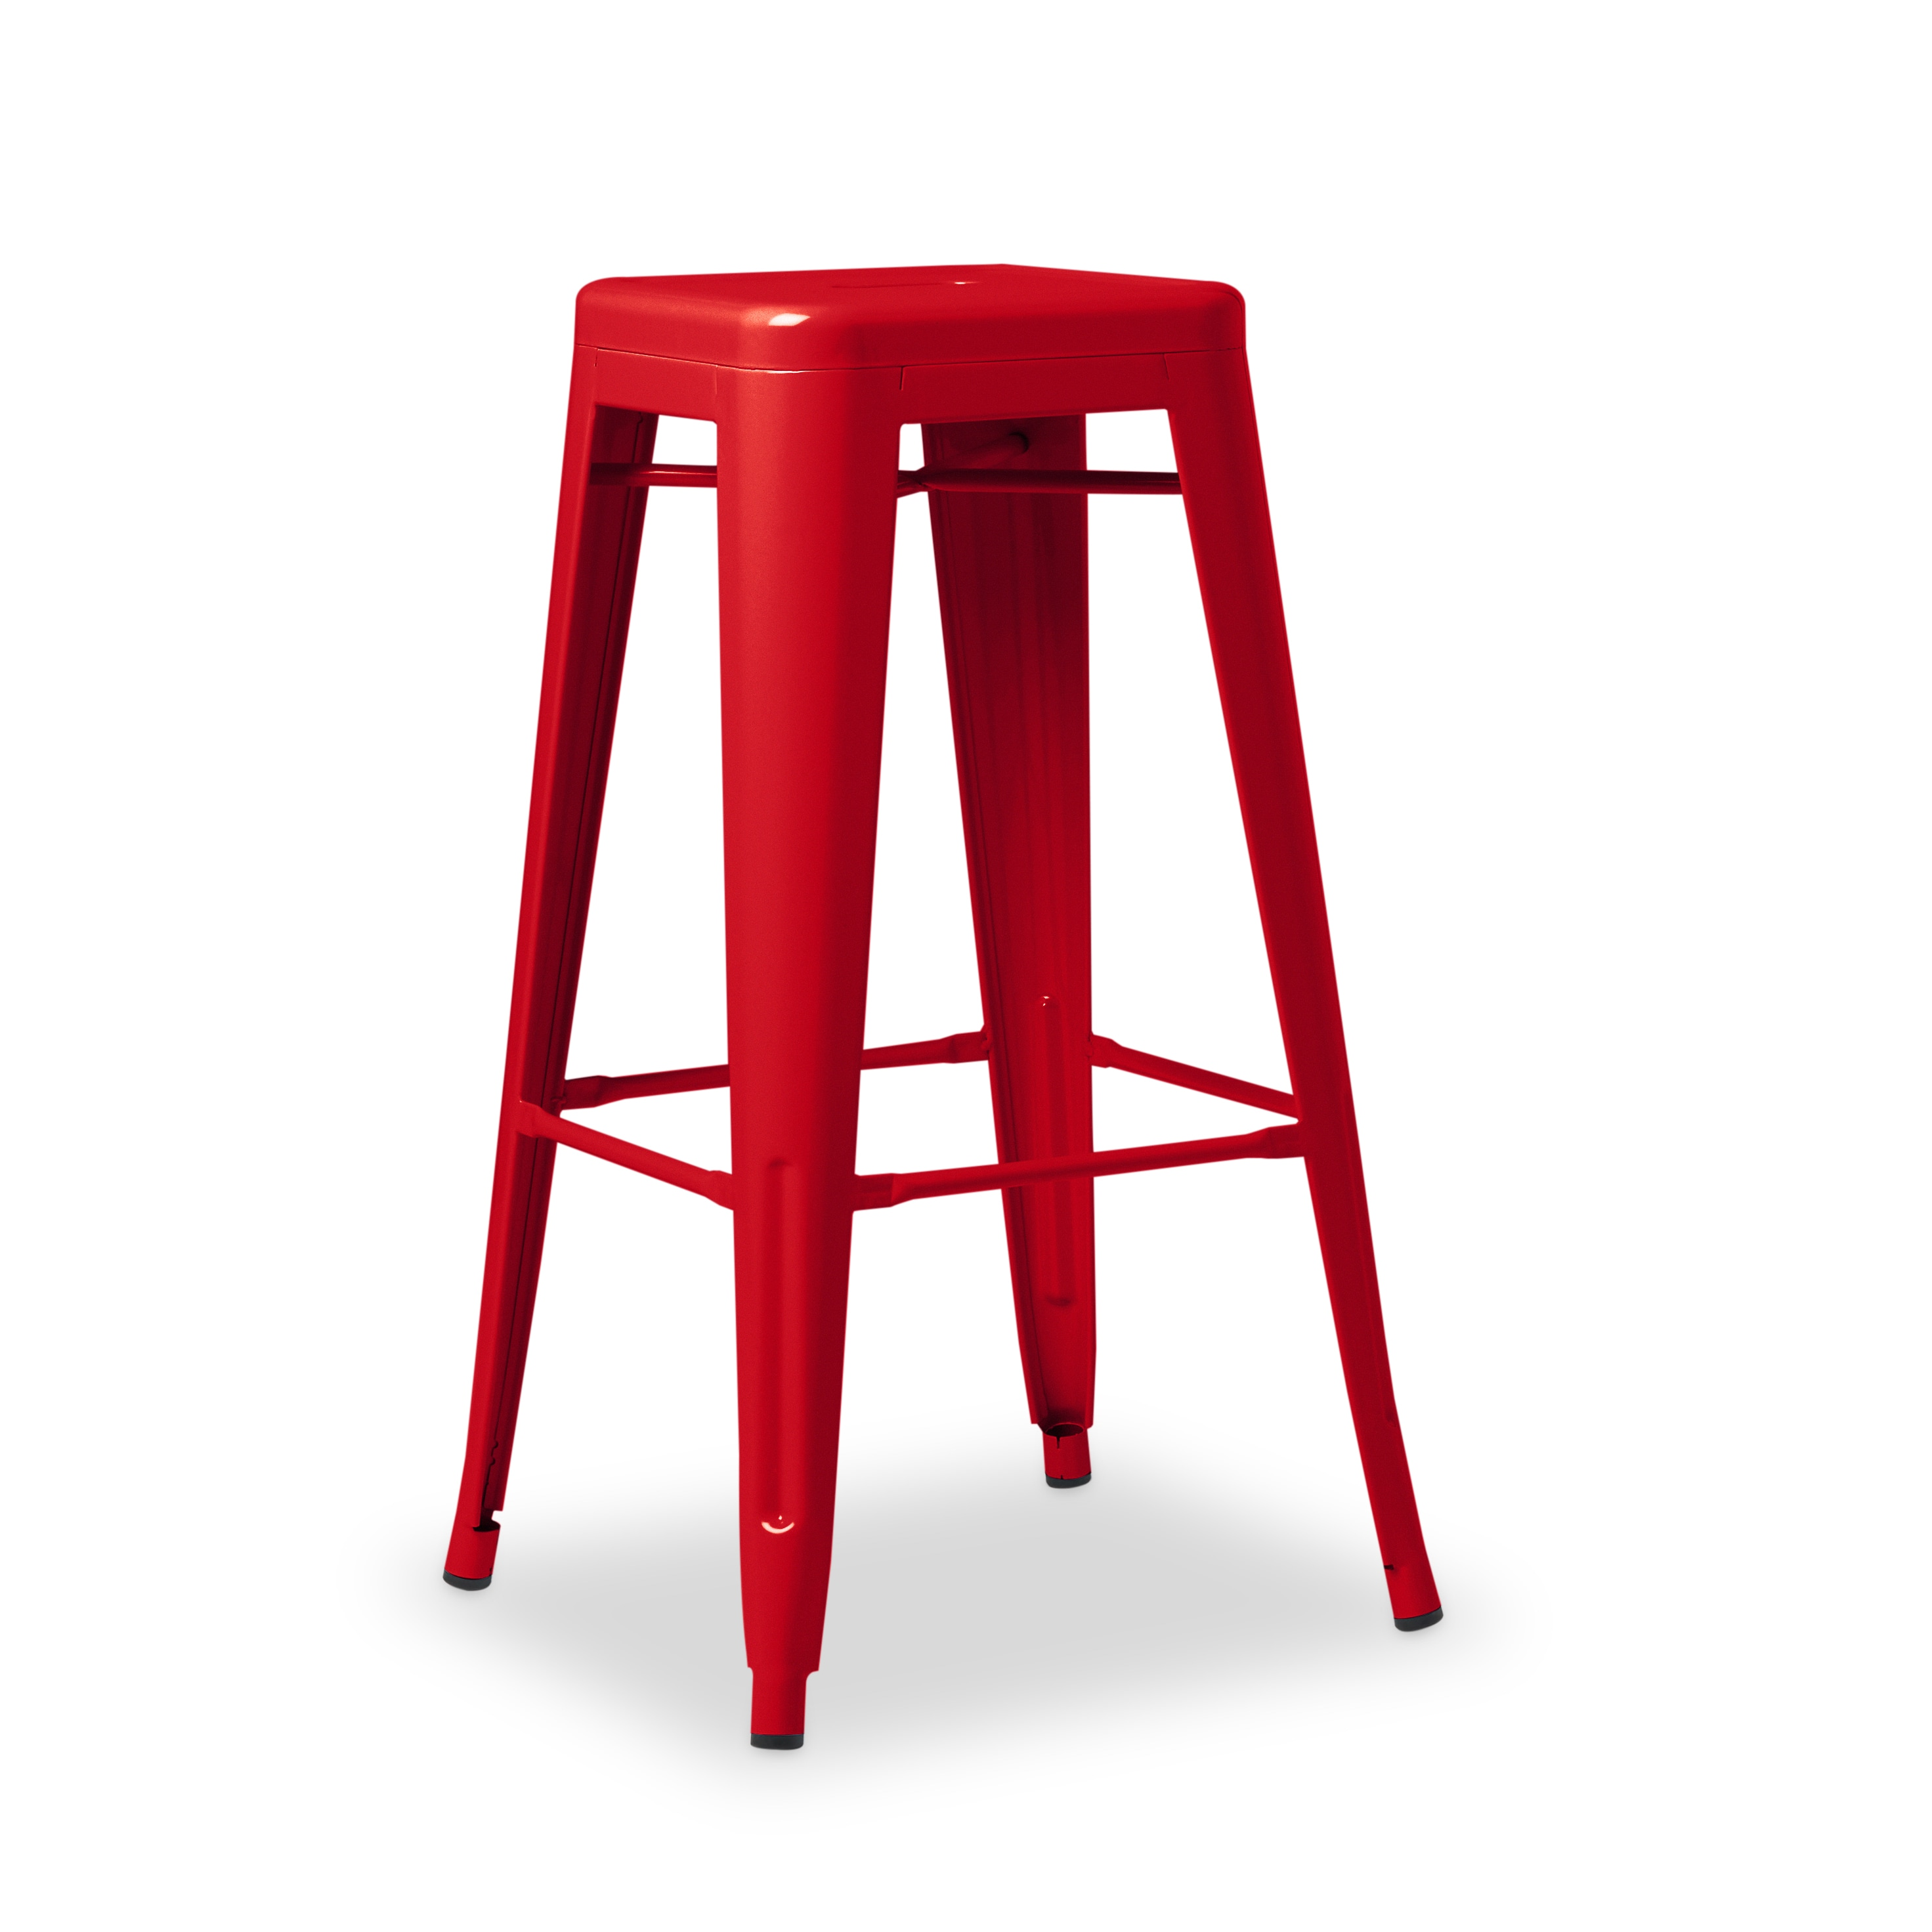 stool orange models model metal bar cgtrader chair max mtl stools furniture unitypackage obj fbx